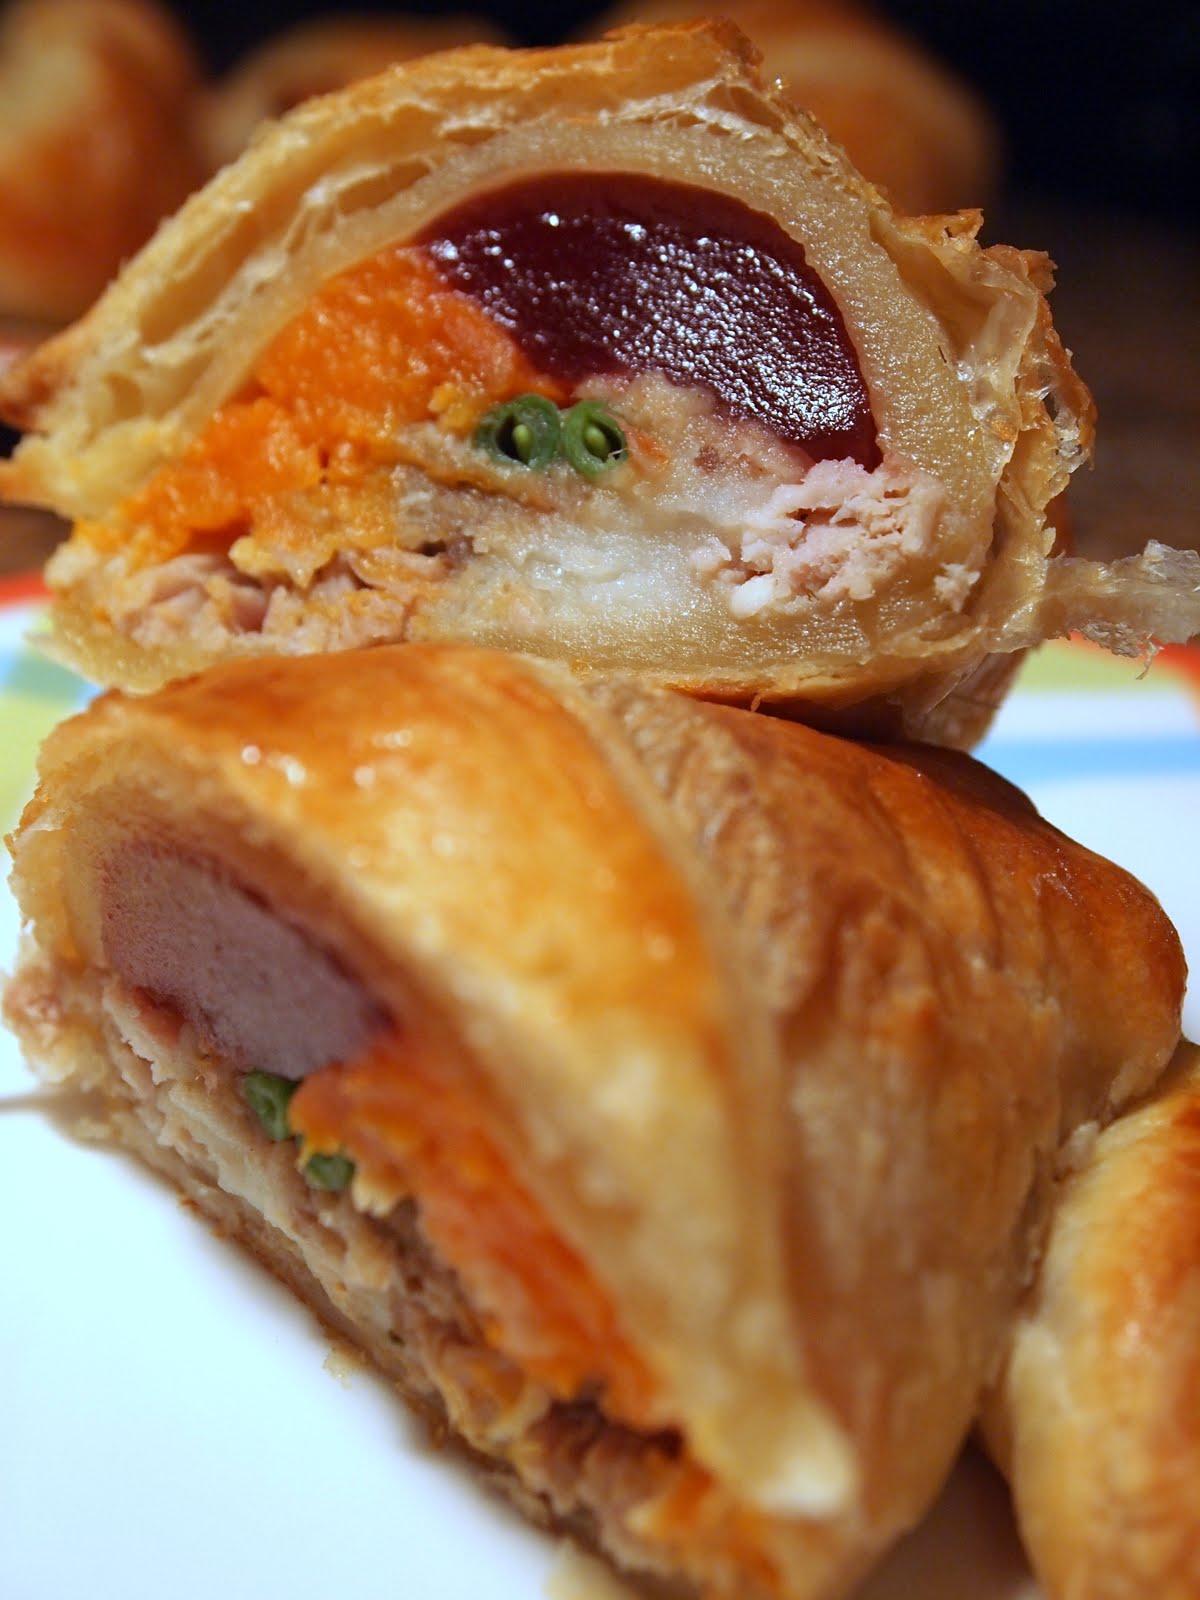 Thanksgiving Stuffed Croissants - It's Borderline Genius